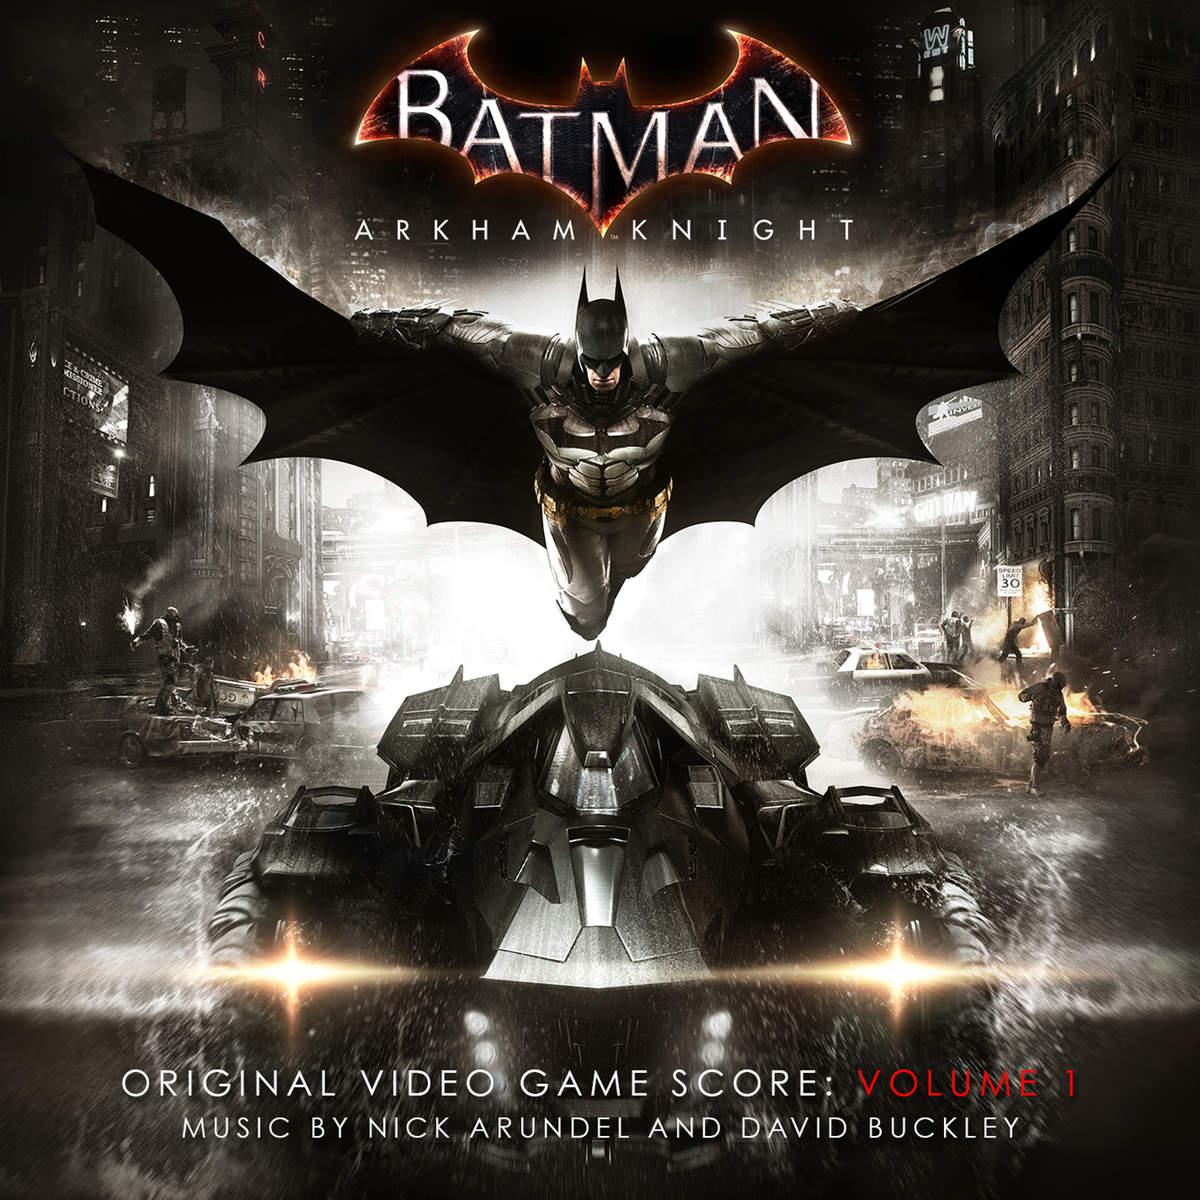 Batman_Arkham_Knight_Original_Video_Game-_Score_Volume_1__cover1200x1200.jpg